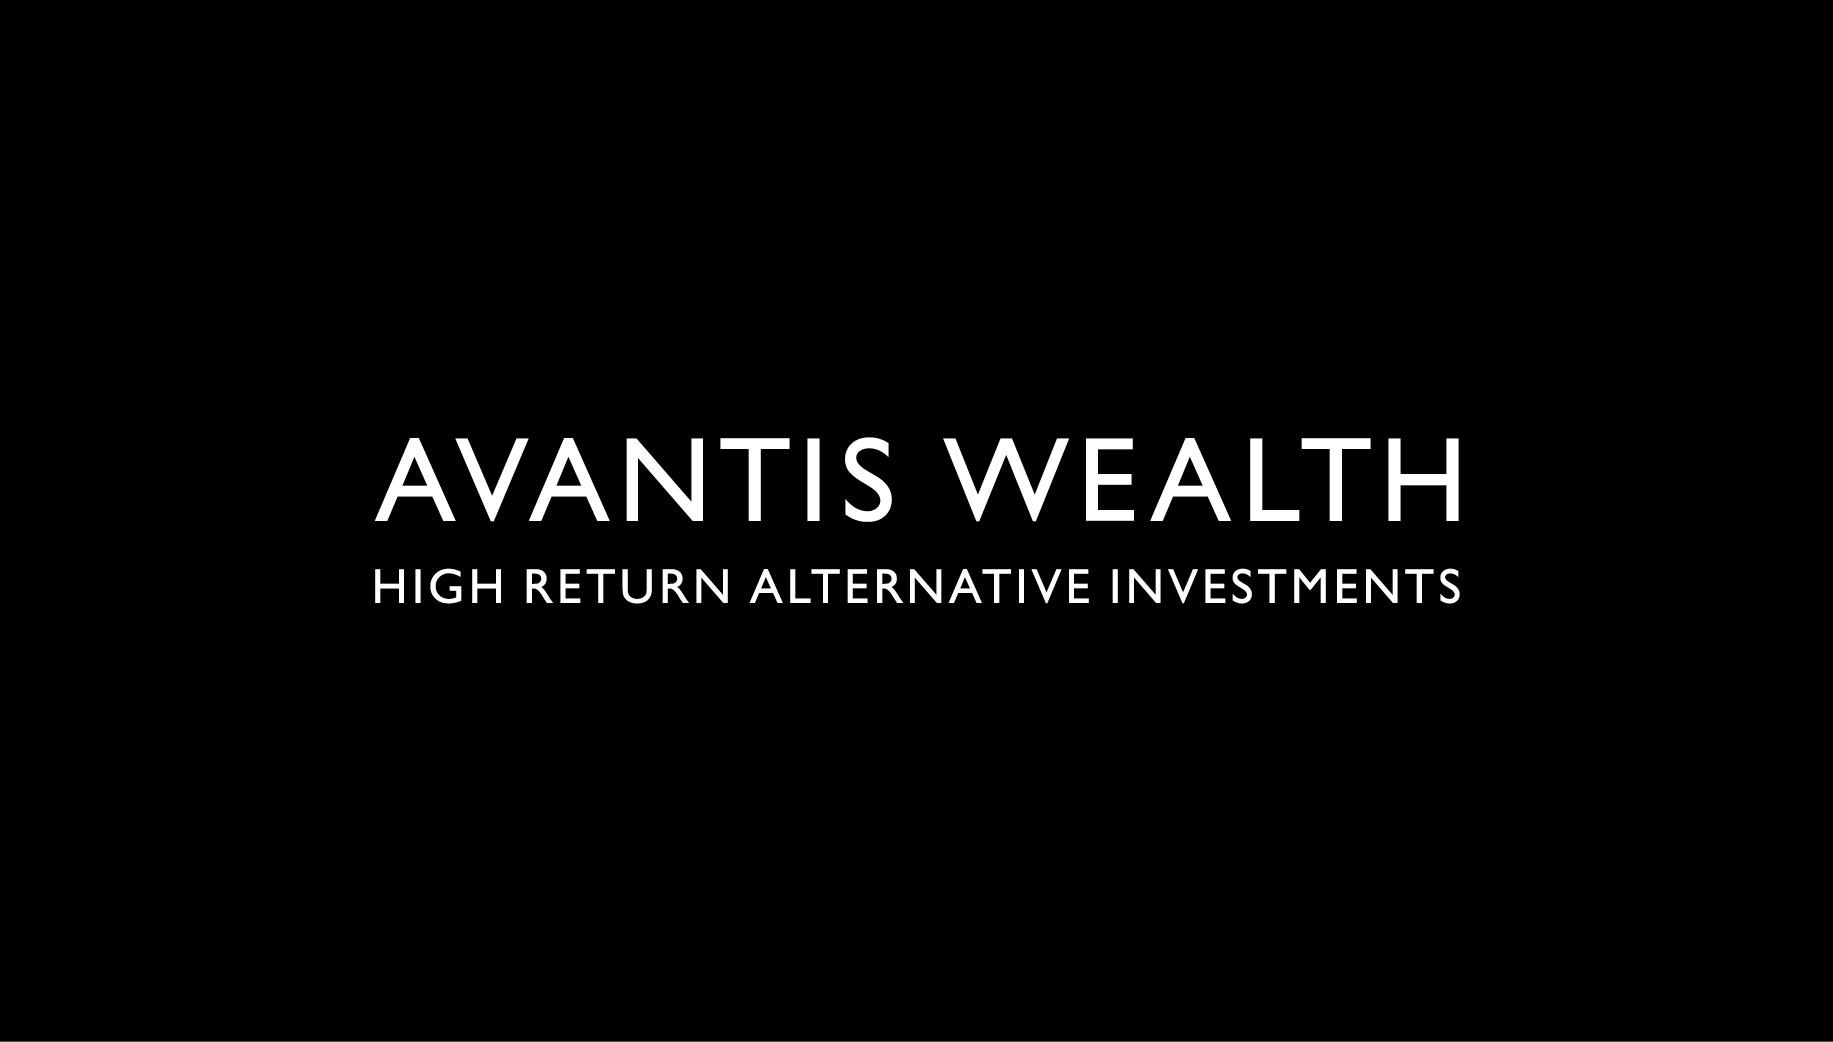 Avantis Wealth logo